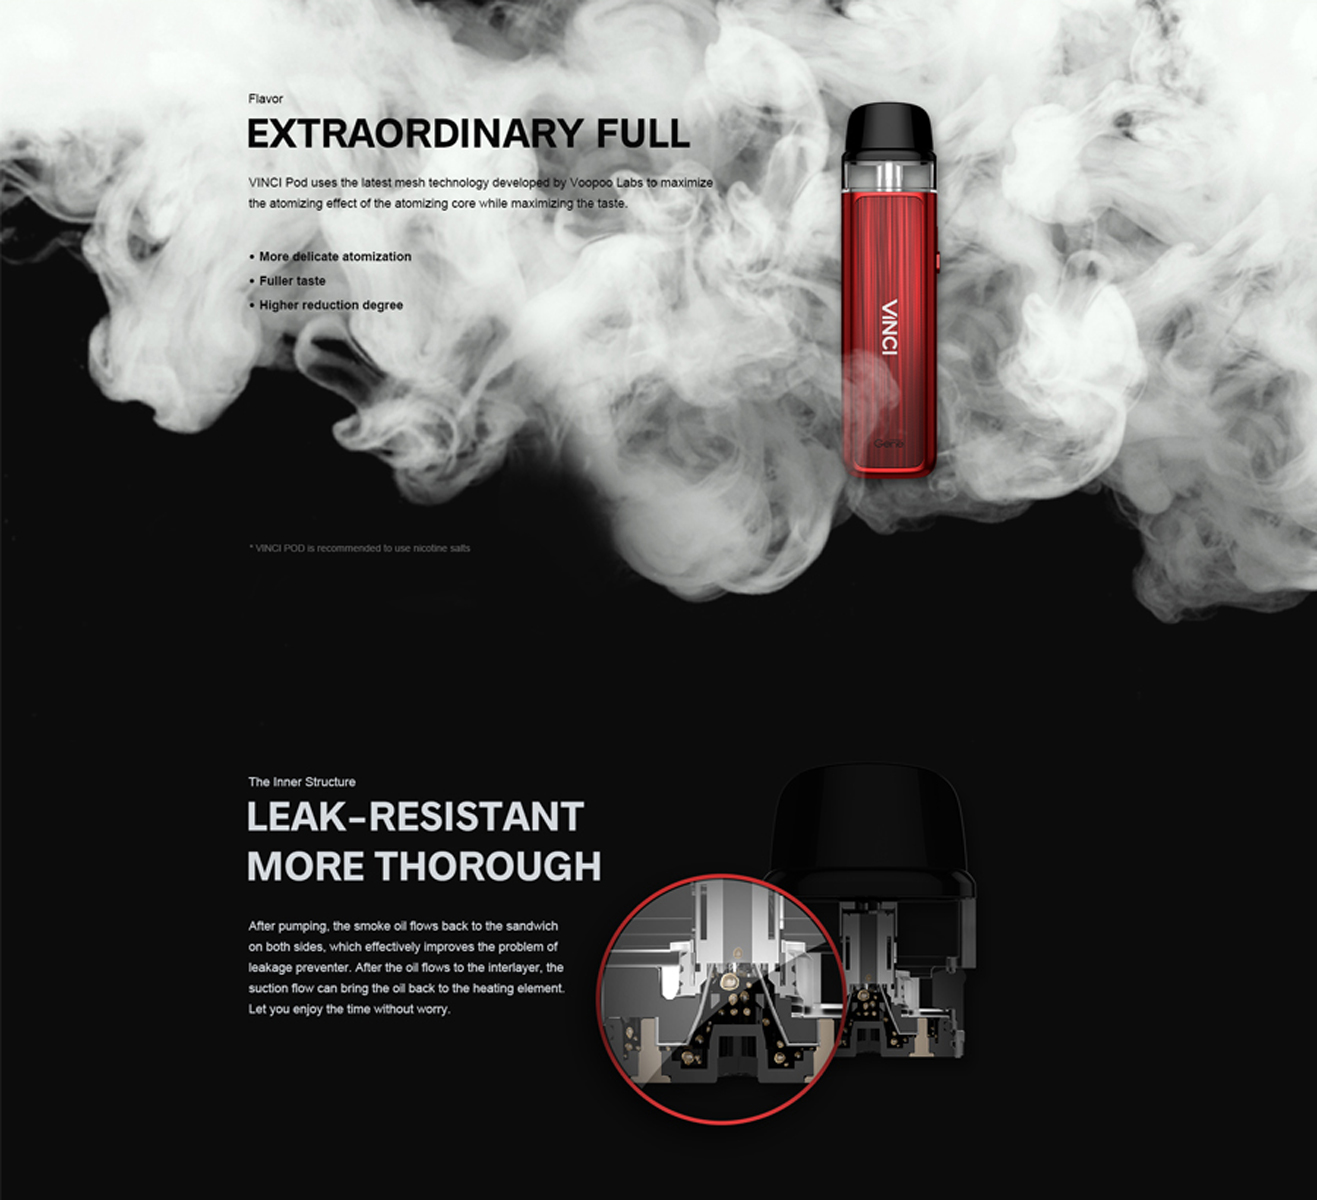 Voopoo Vinci Pod leak resistant